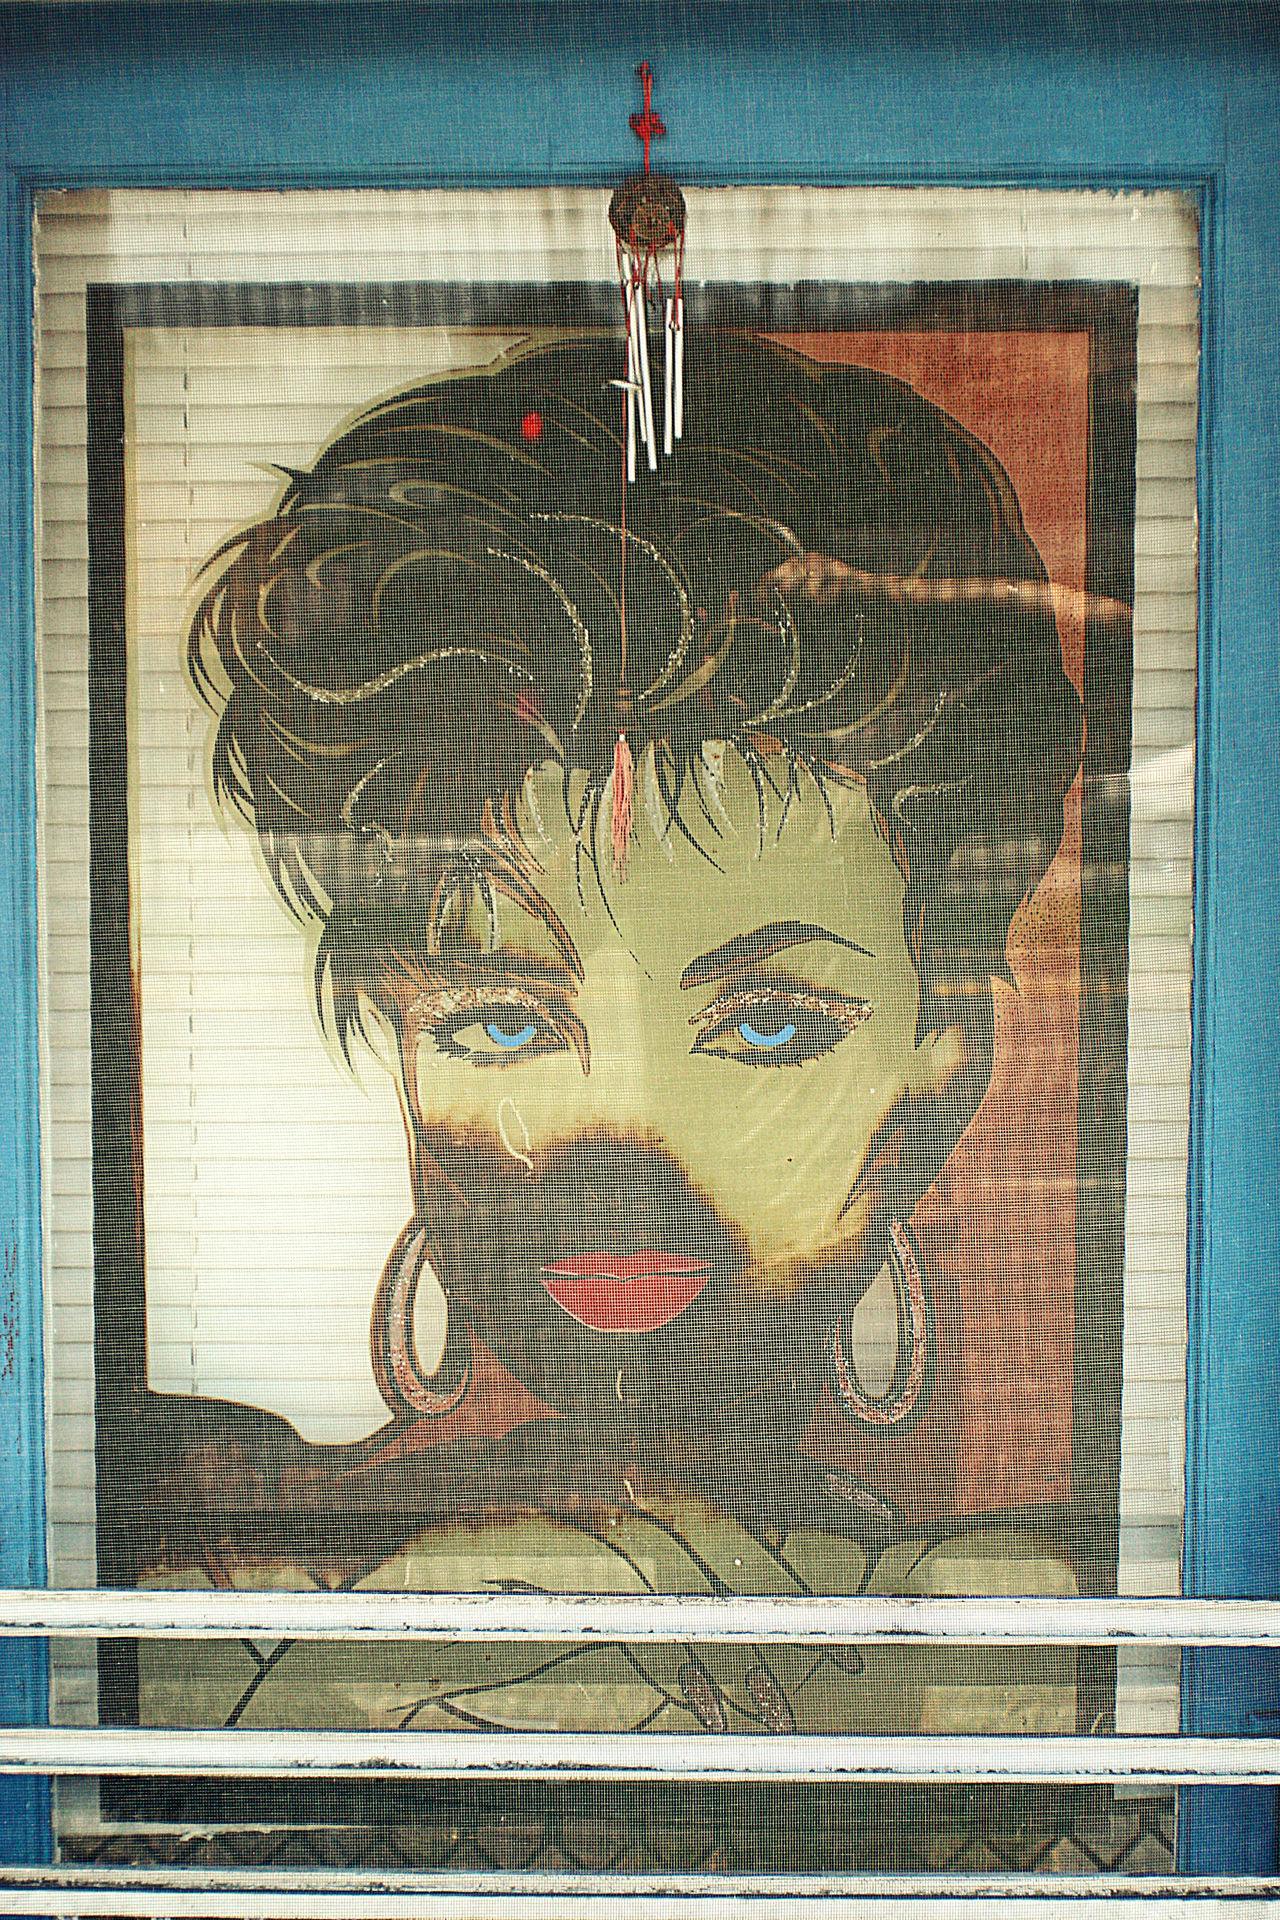 #bearded Lady #ghetto #Nagel #Design #stock Illustration #urban Nail Salon Salon Small Business